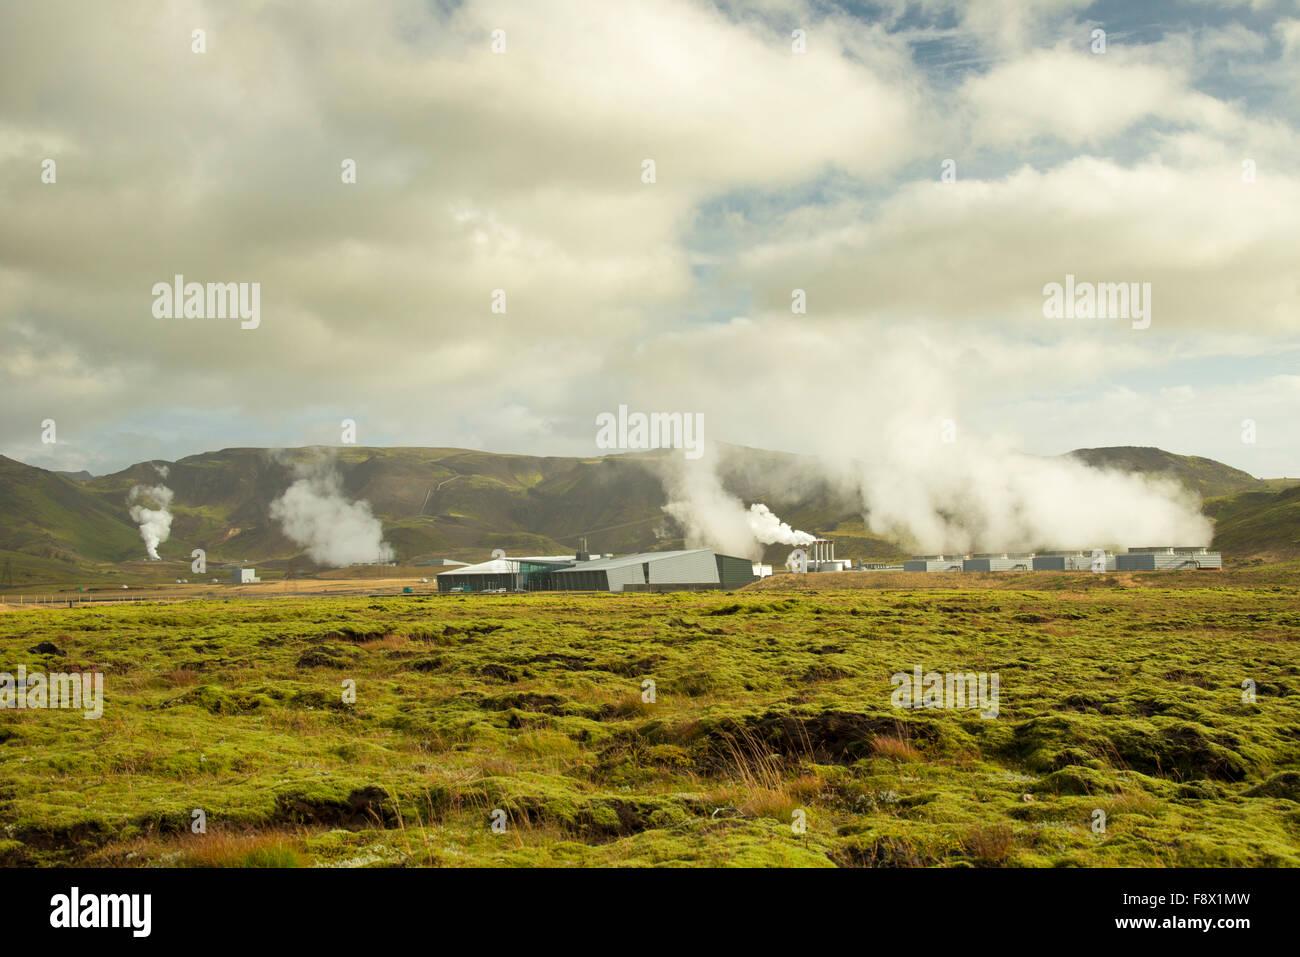 Reykjavik, Iceland. Geothermal power plant. - Stock Image